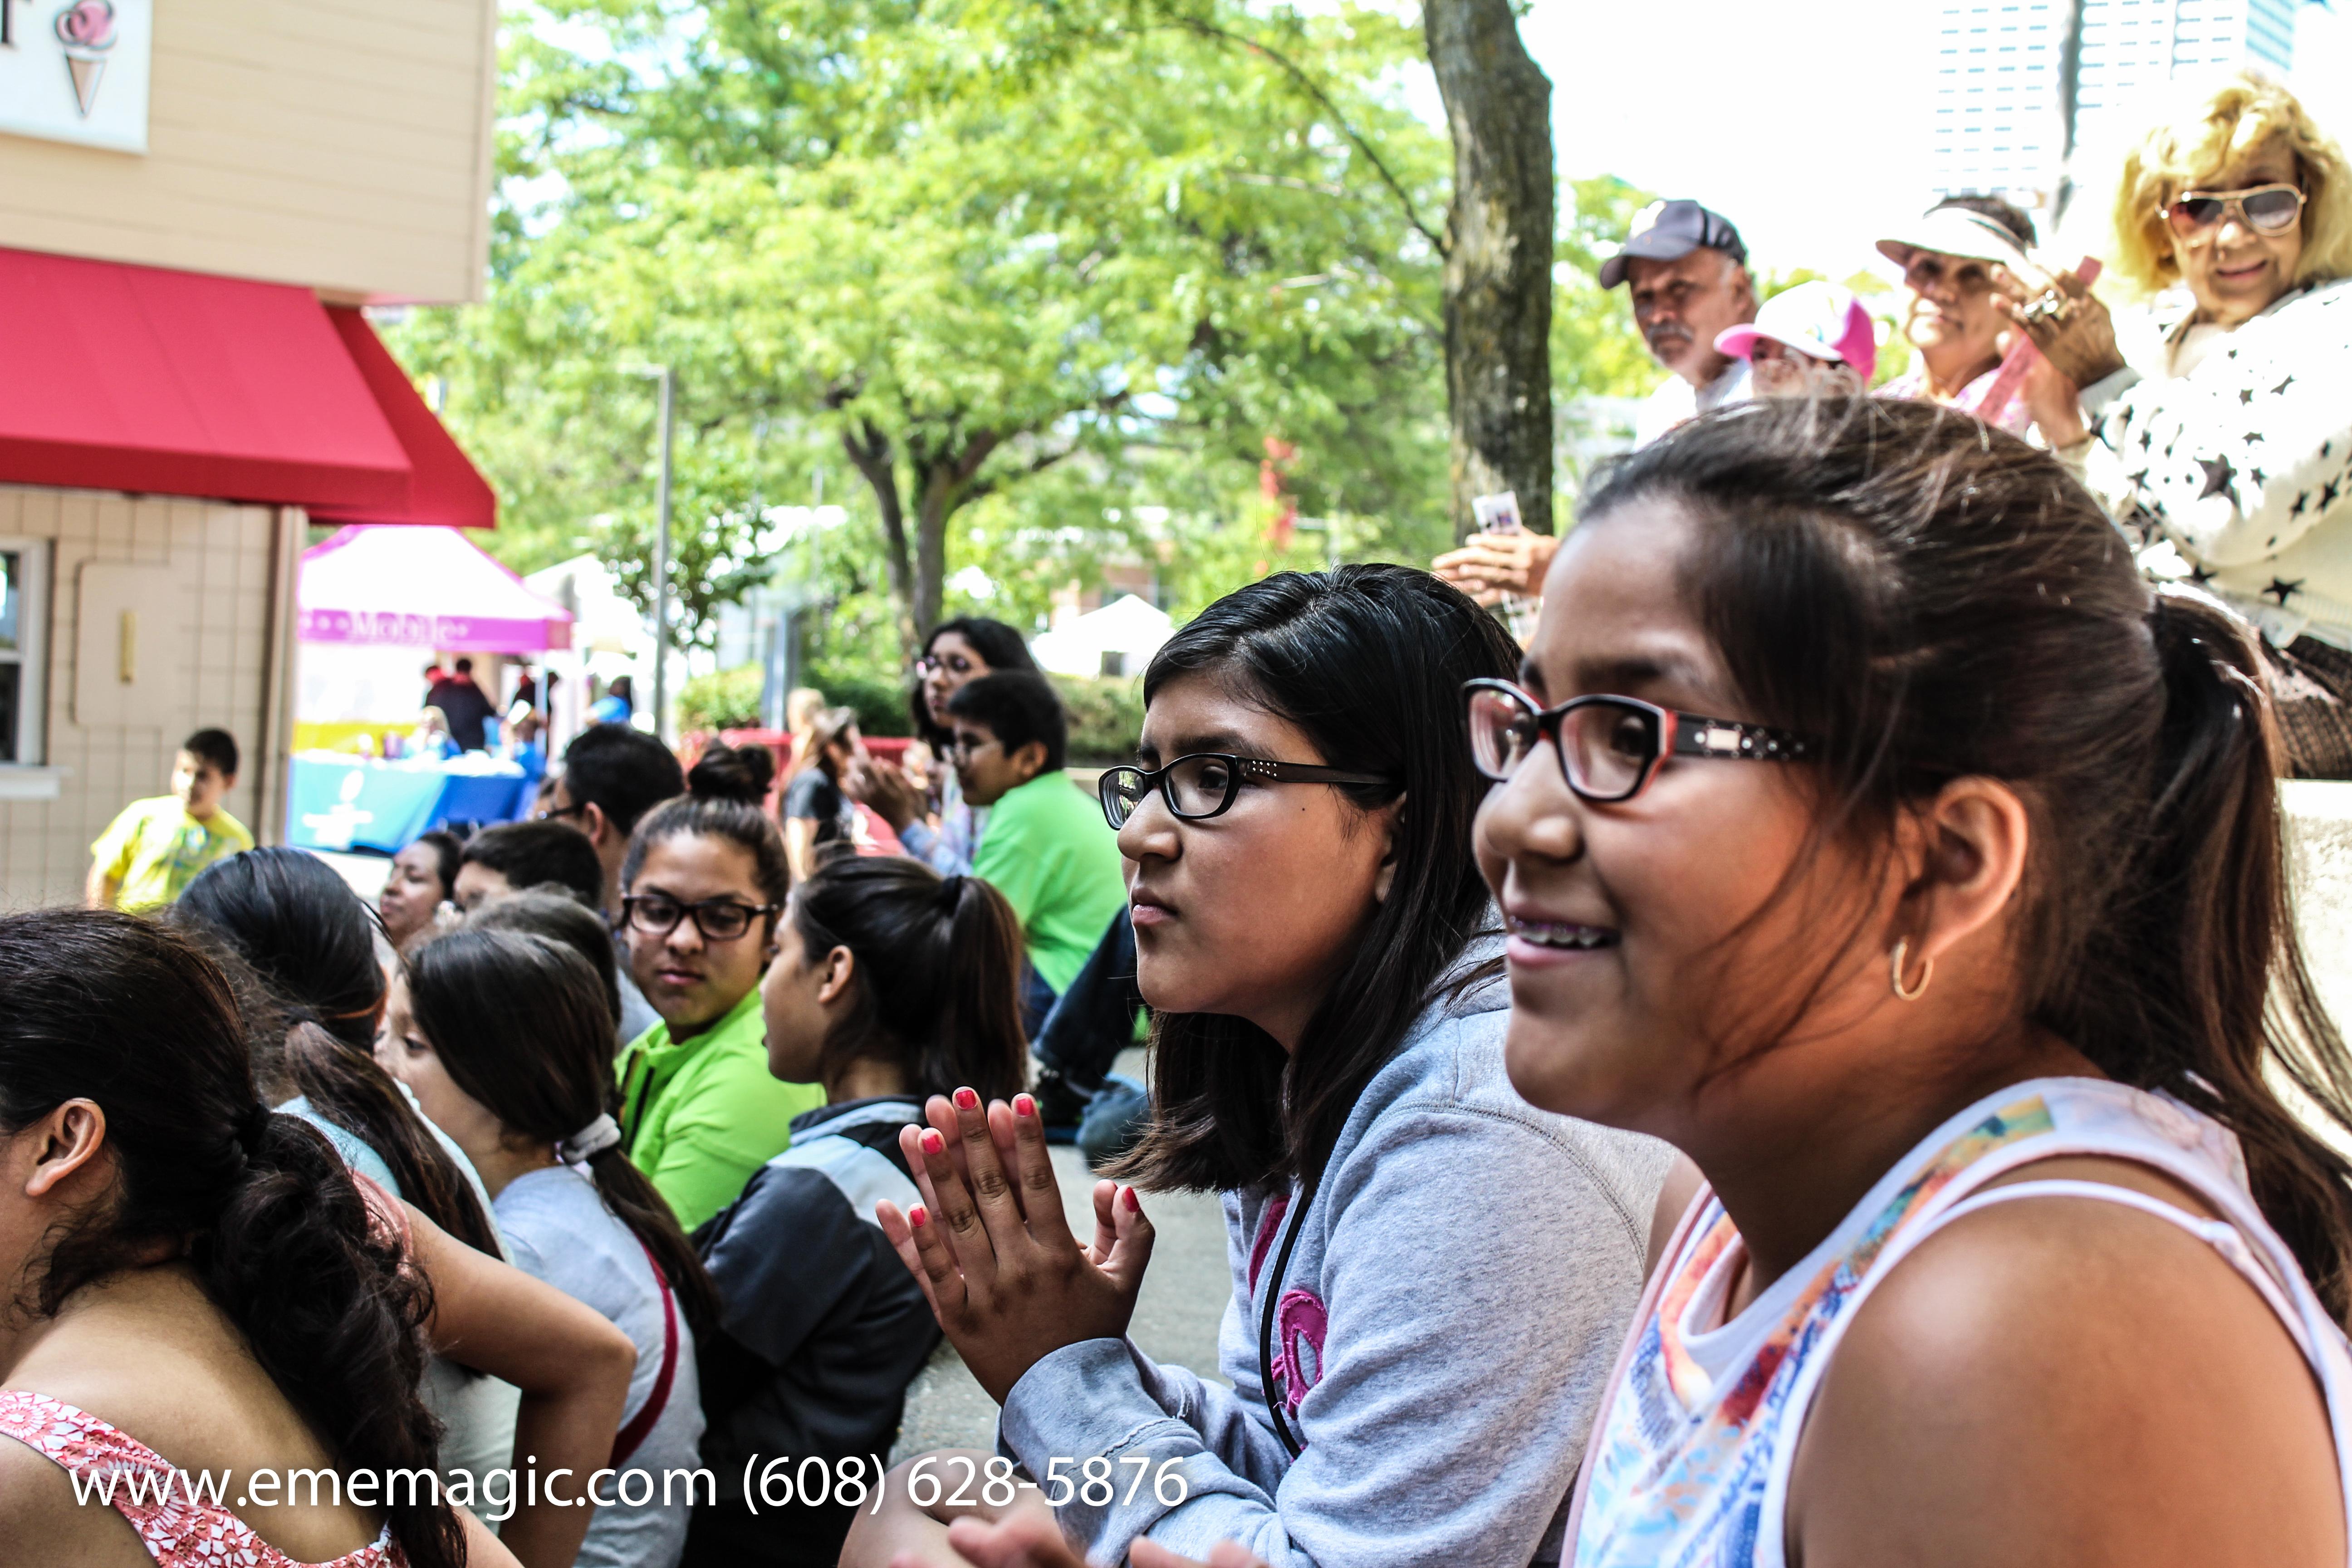 ememagic mexican fiesta 1 2015-36